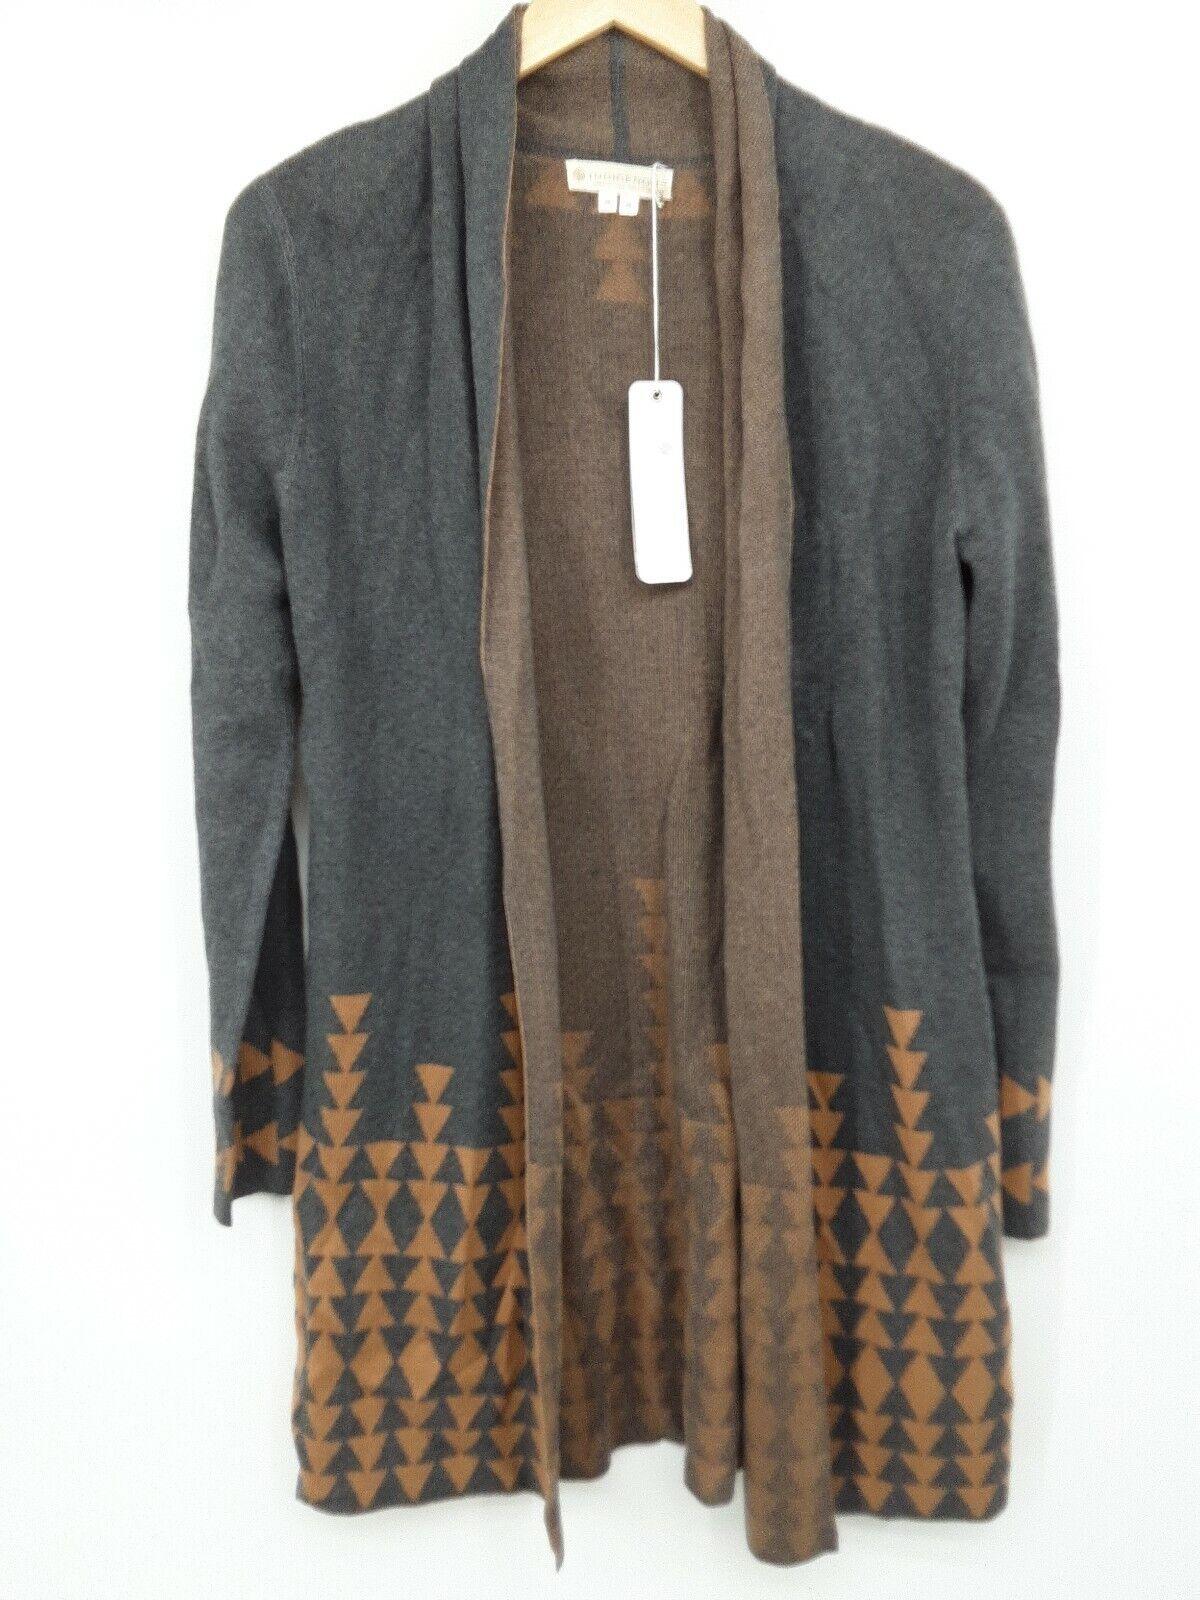 NWT Indigenous Designs Women's Sweater Jacquard Long Cardigan Charcoal Camel...